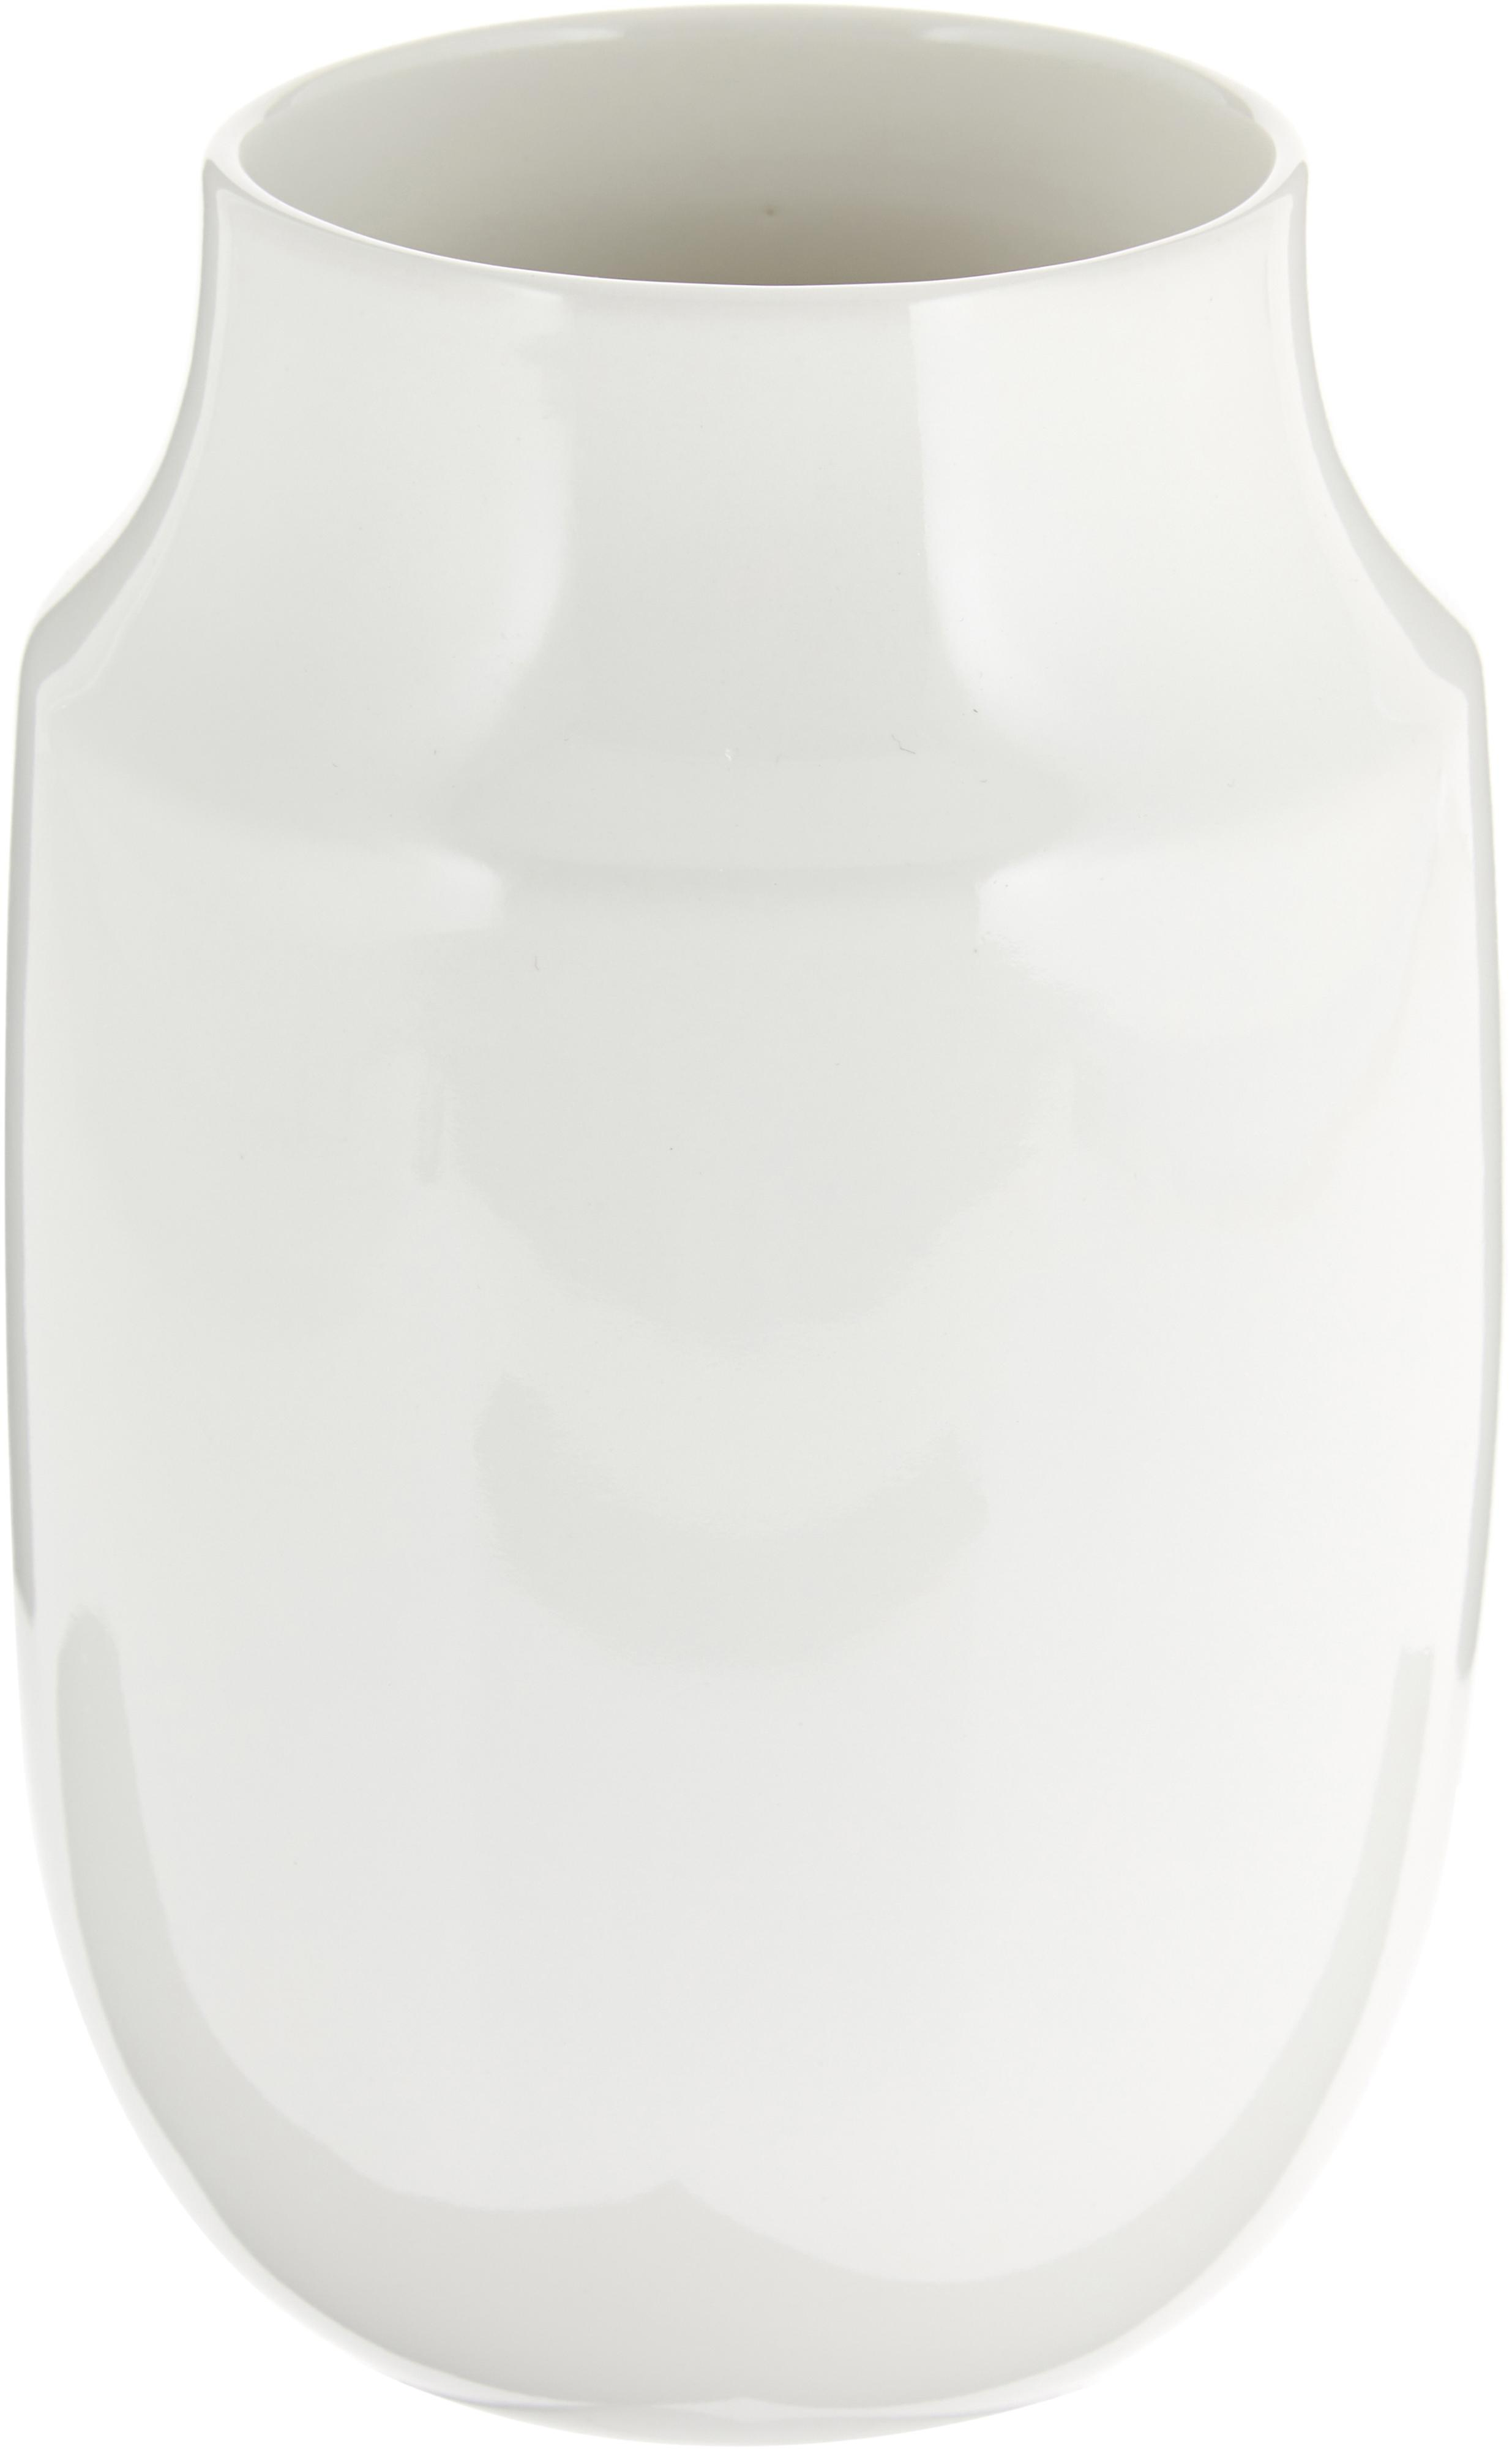 Handgemaakte vaas Valeria, Keramiek, Glanzend wit, Ø 13 x H 20 cm